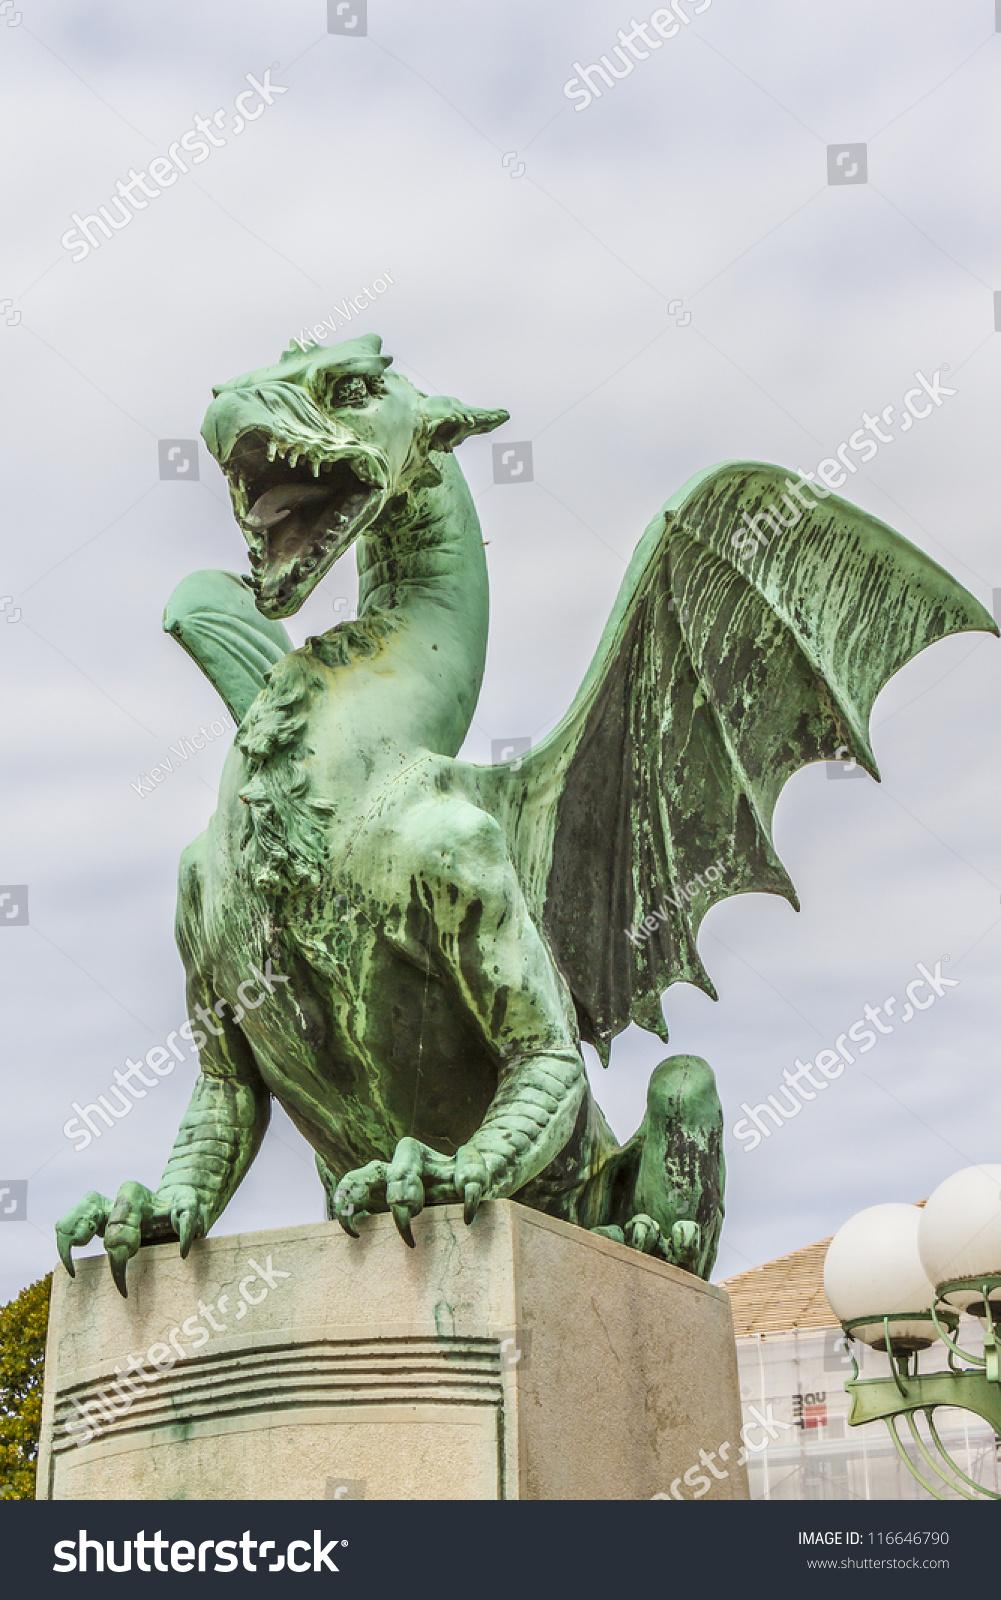 Royalty free green dragon symbol of the slovenian 116646790 green dragon symbol of the slovenian capital city on the dragon bridge ljubljana biocorpaavc Image collections